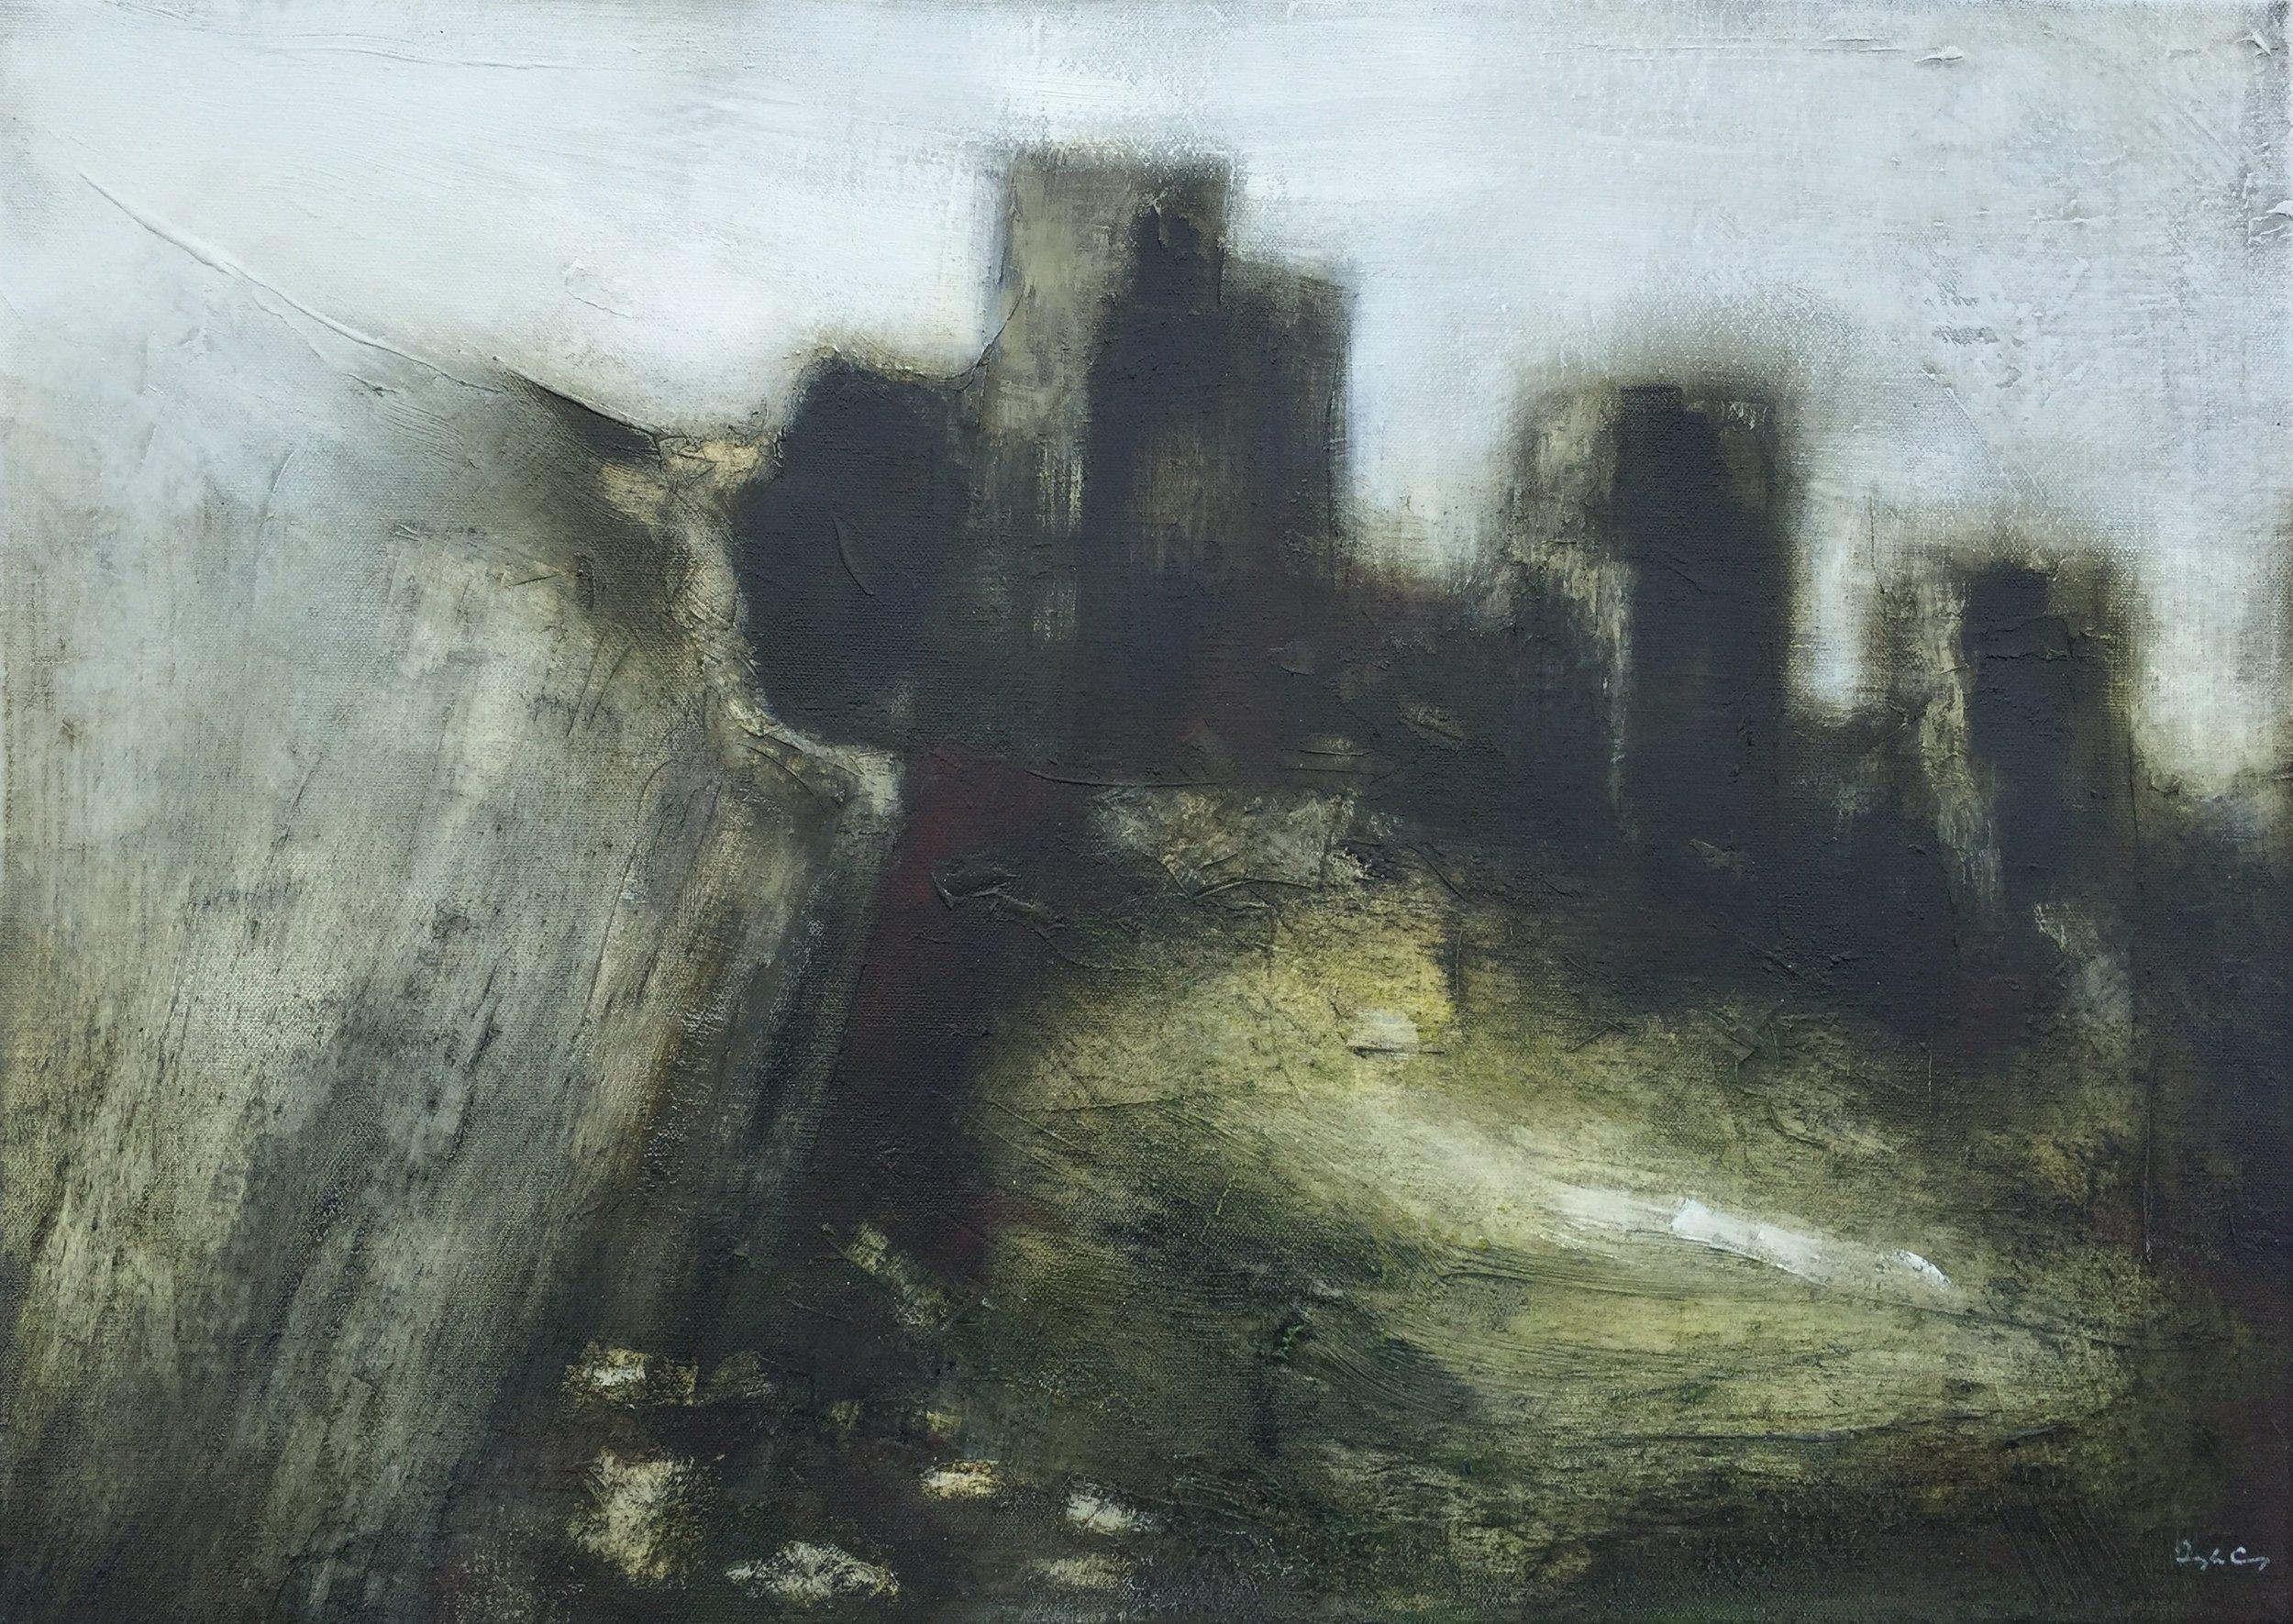 Promontory   oil on canvas, painting 50cm x 70cm, frame 55cm x 75cm, €780